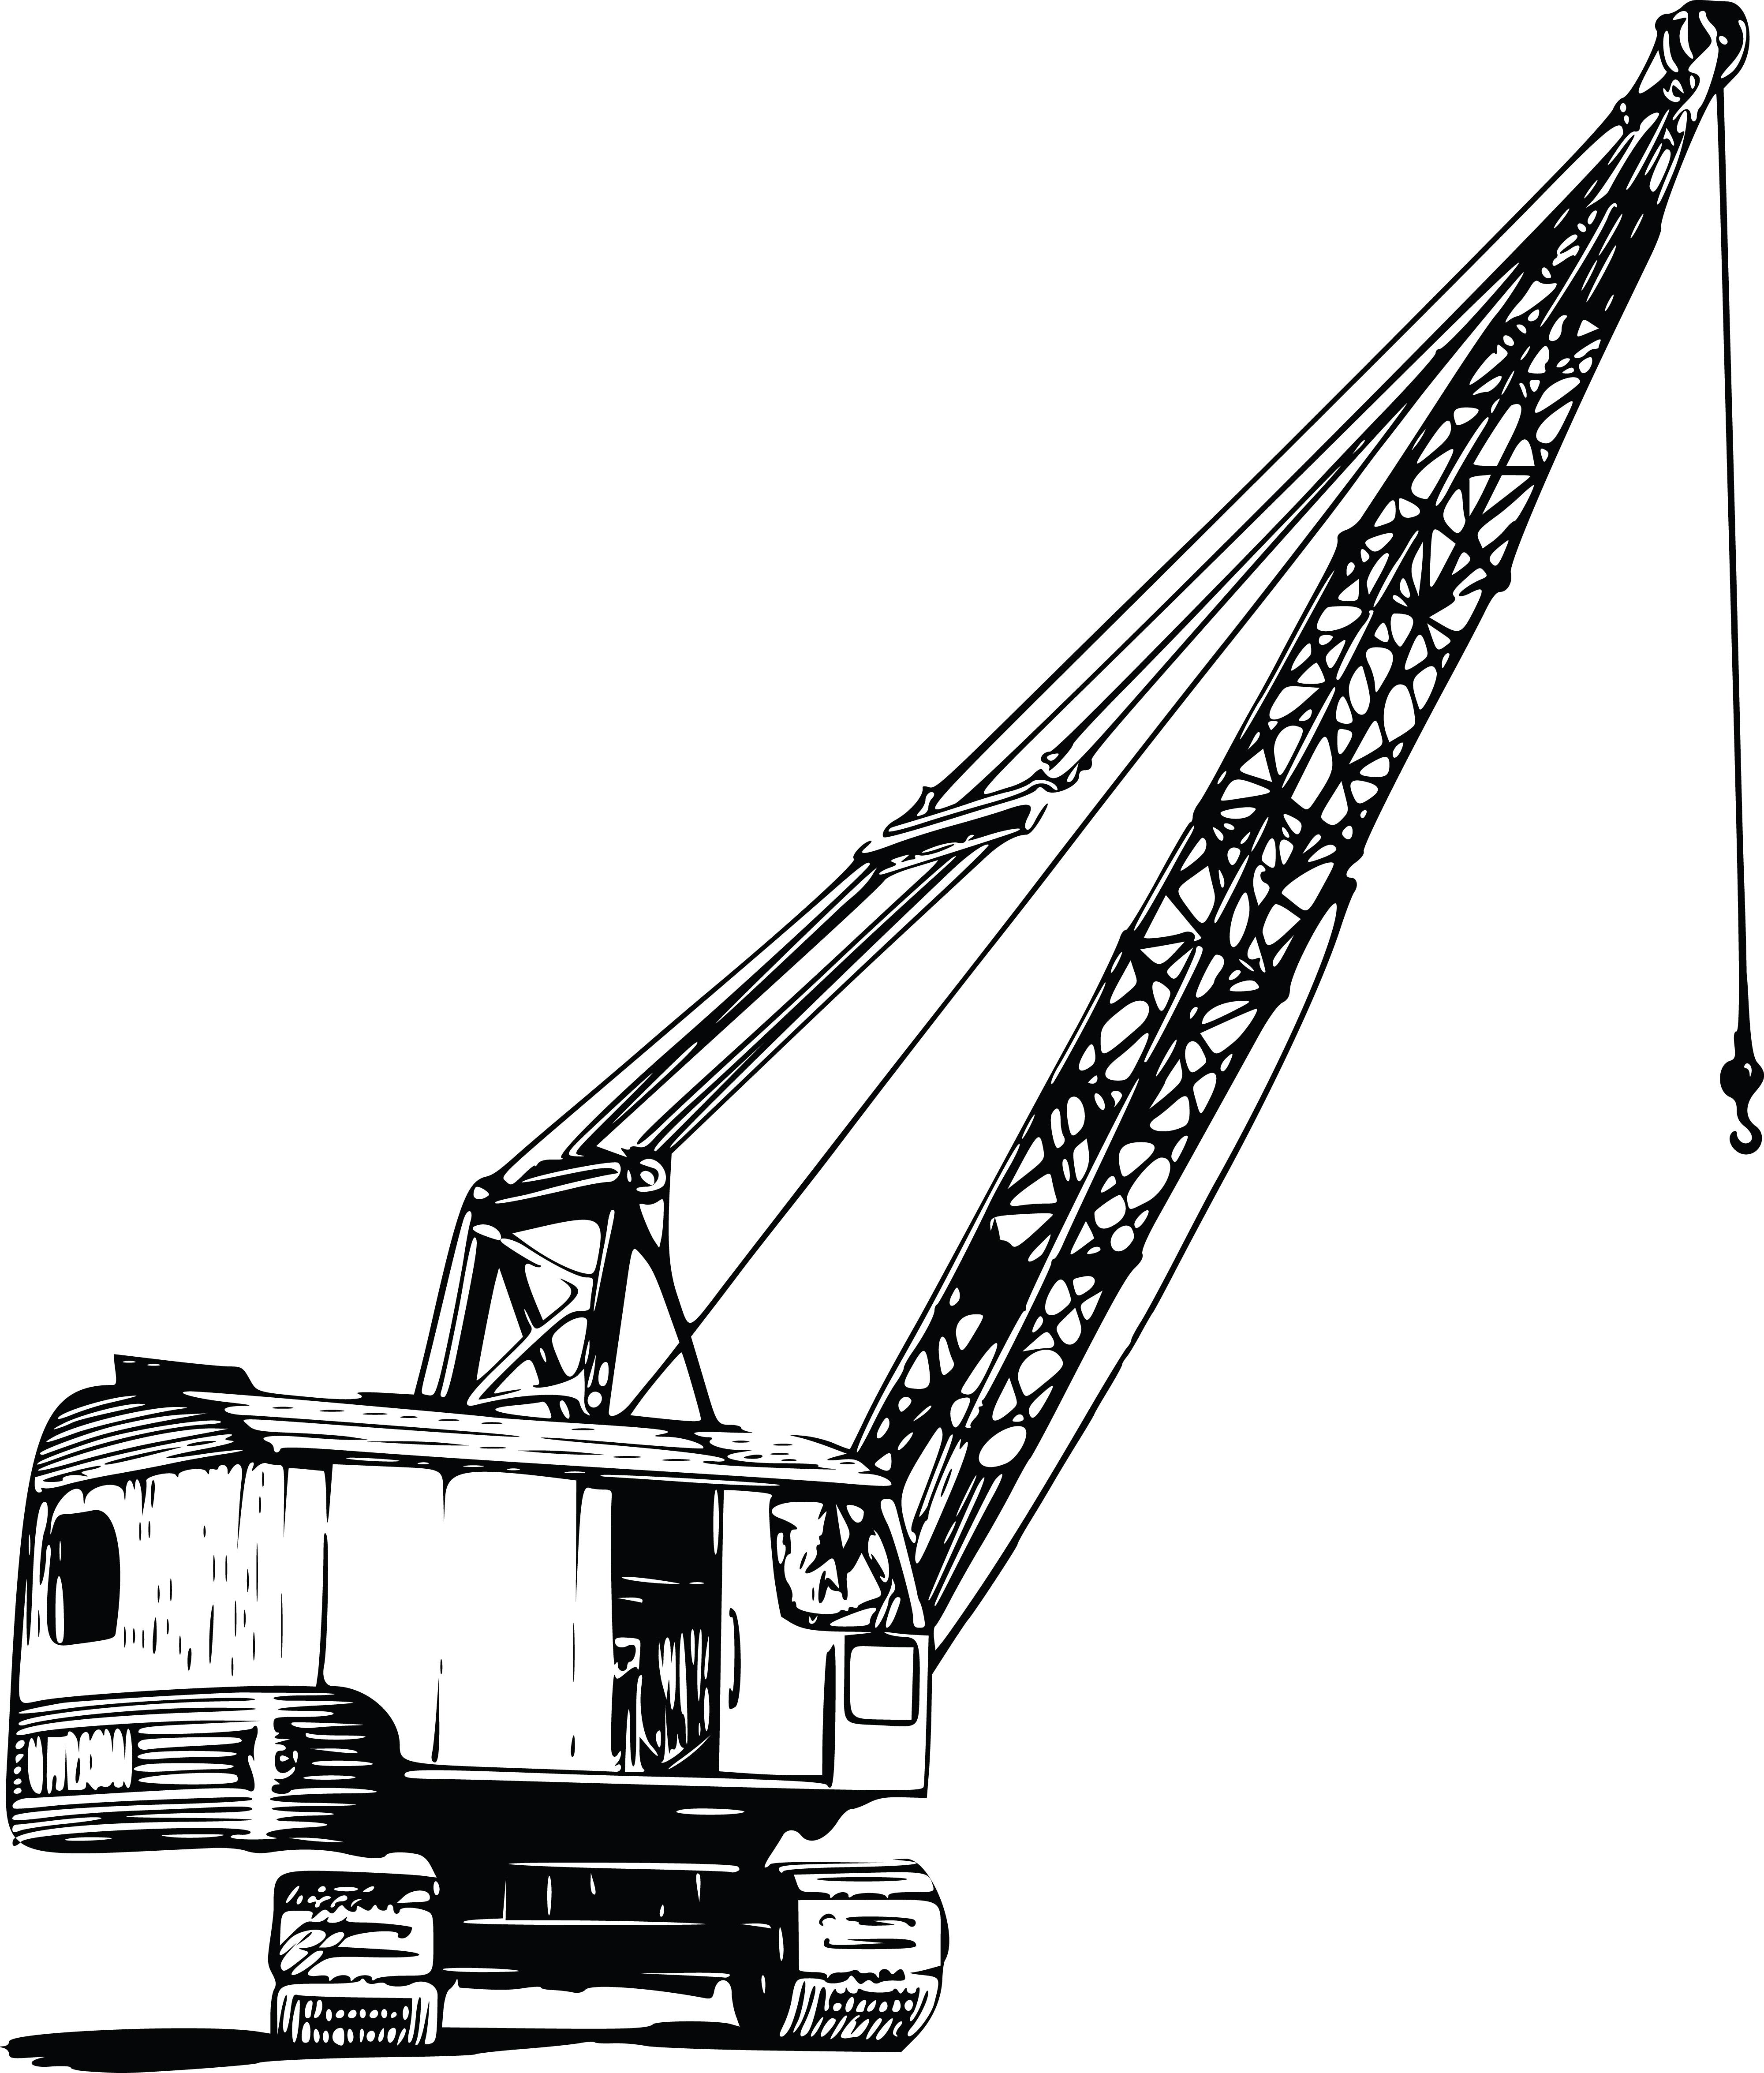 4000x4700 Clipart Of A Construction Crane